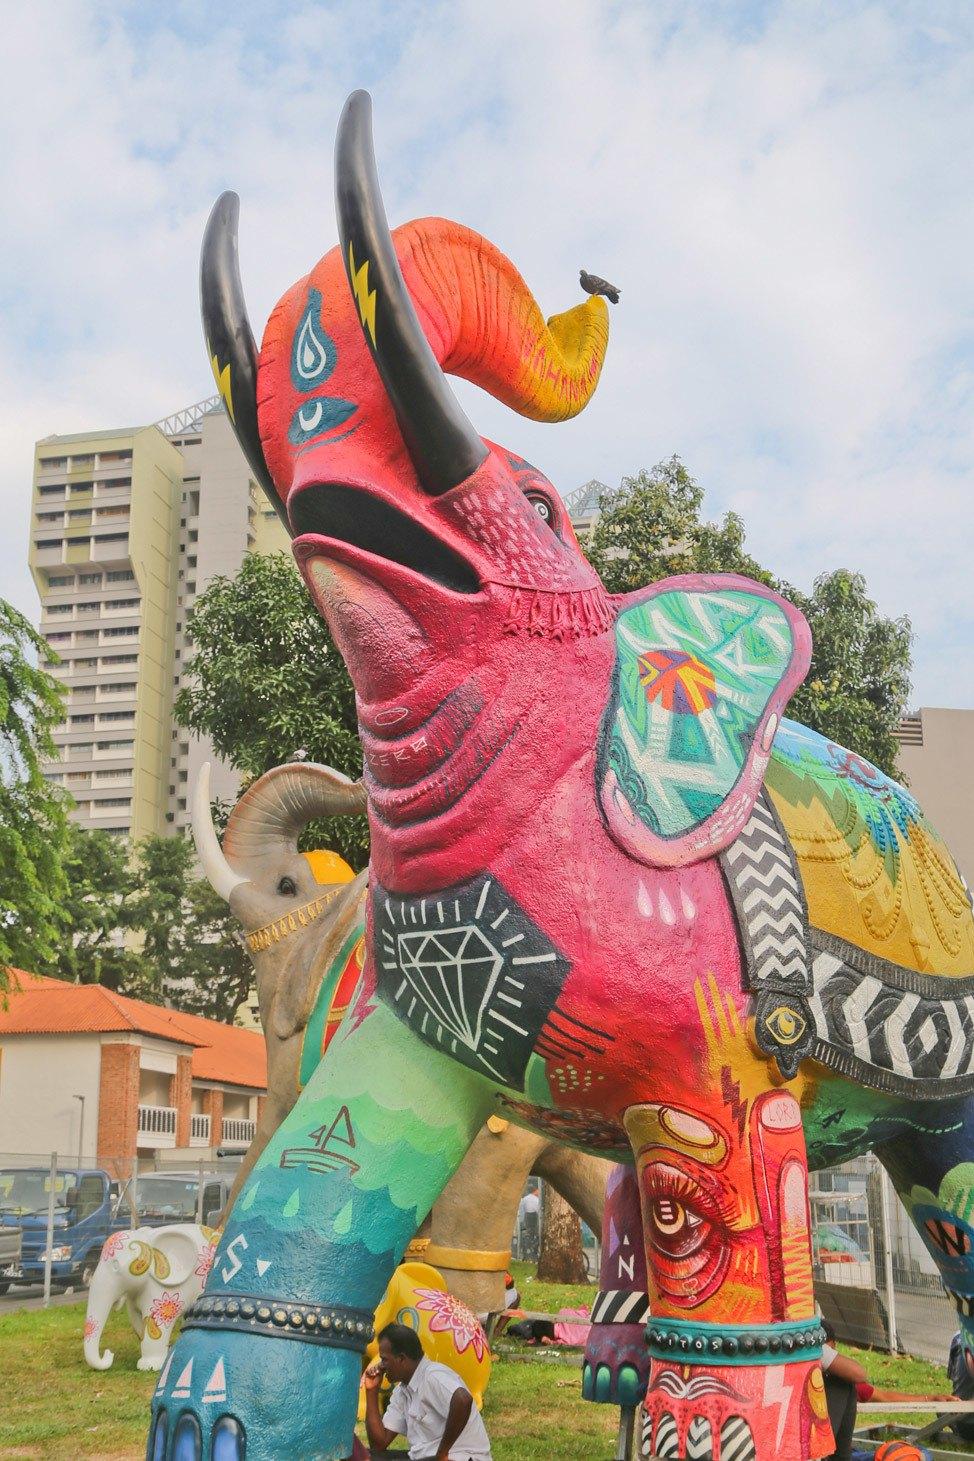 Elephant Sculpture in Little India, Singapore